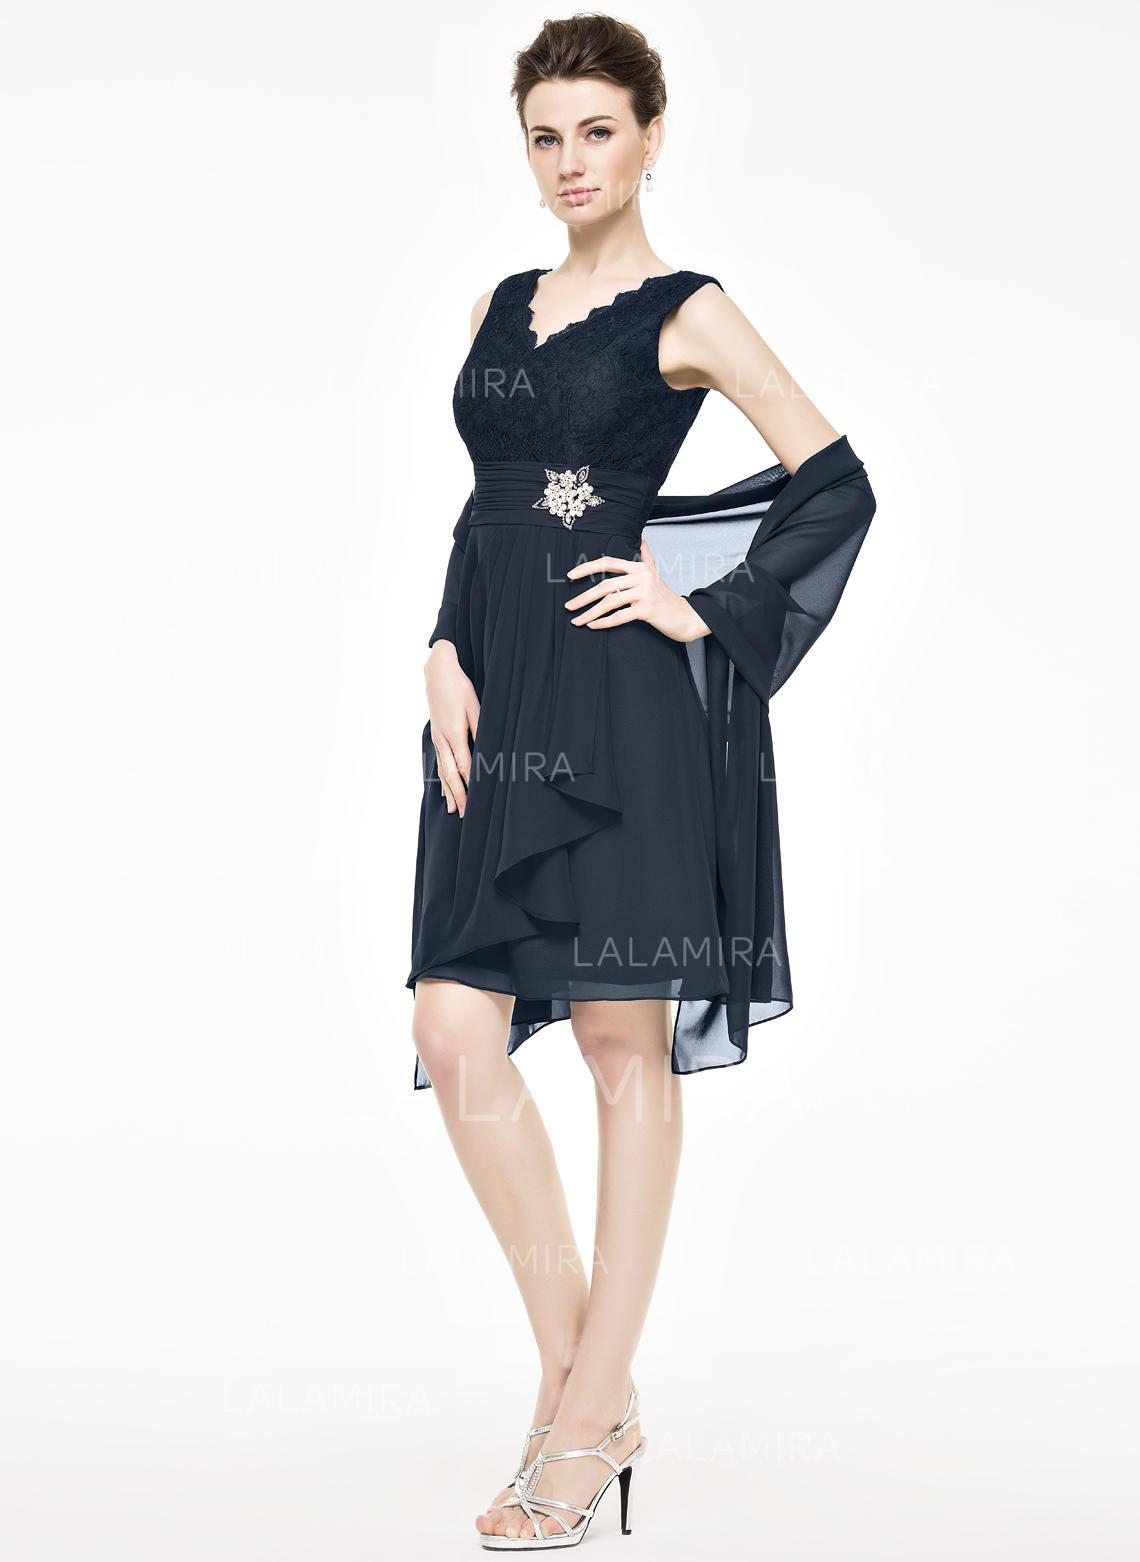 a4d8757b905c ... gray mother of the bride dresses. A-Line/Princess Chiffon Lace  Sleeveless V-neck Knee-Length Zipper Up. Loading zoom